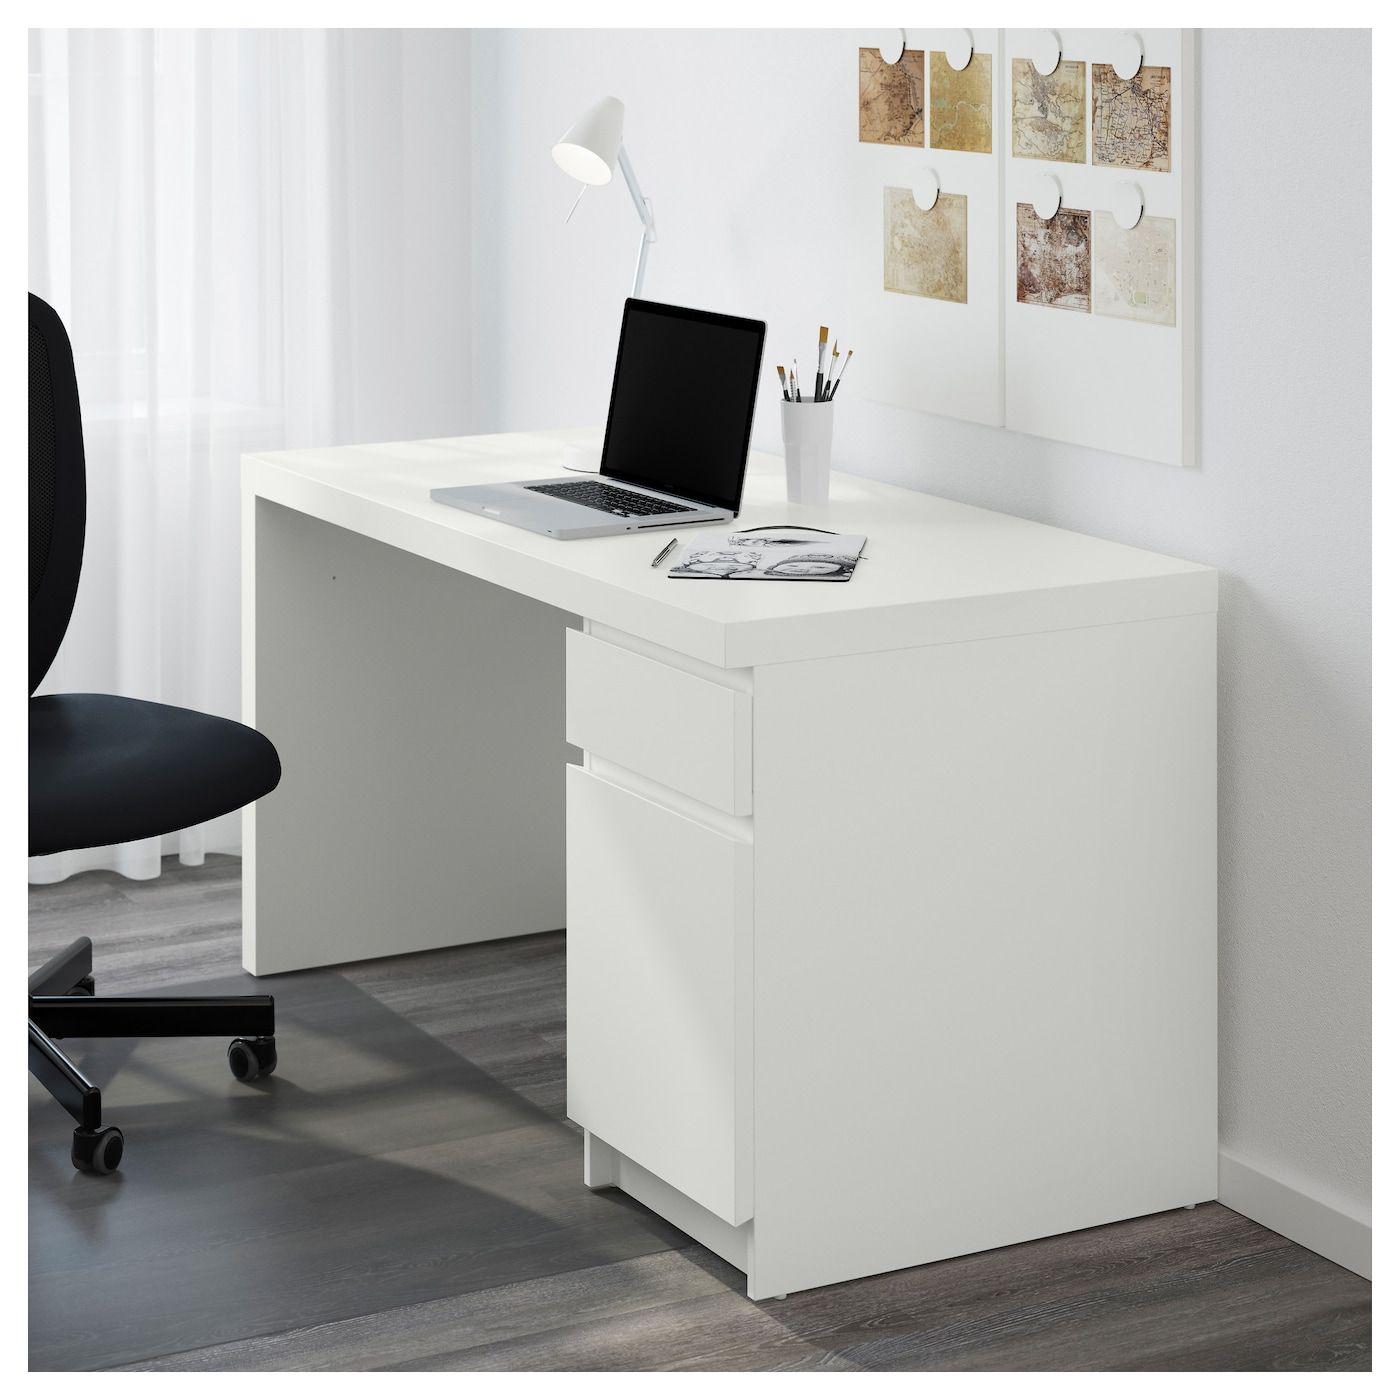 Ikea Bureau Zwart Wit.Pin Op Home Is Where The Aesthetics Are